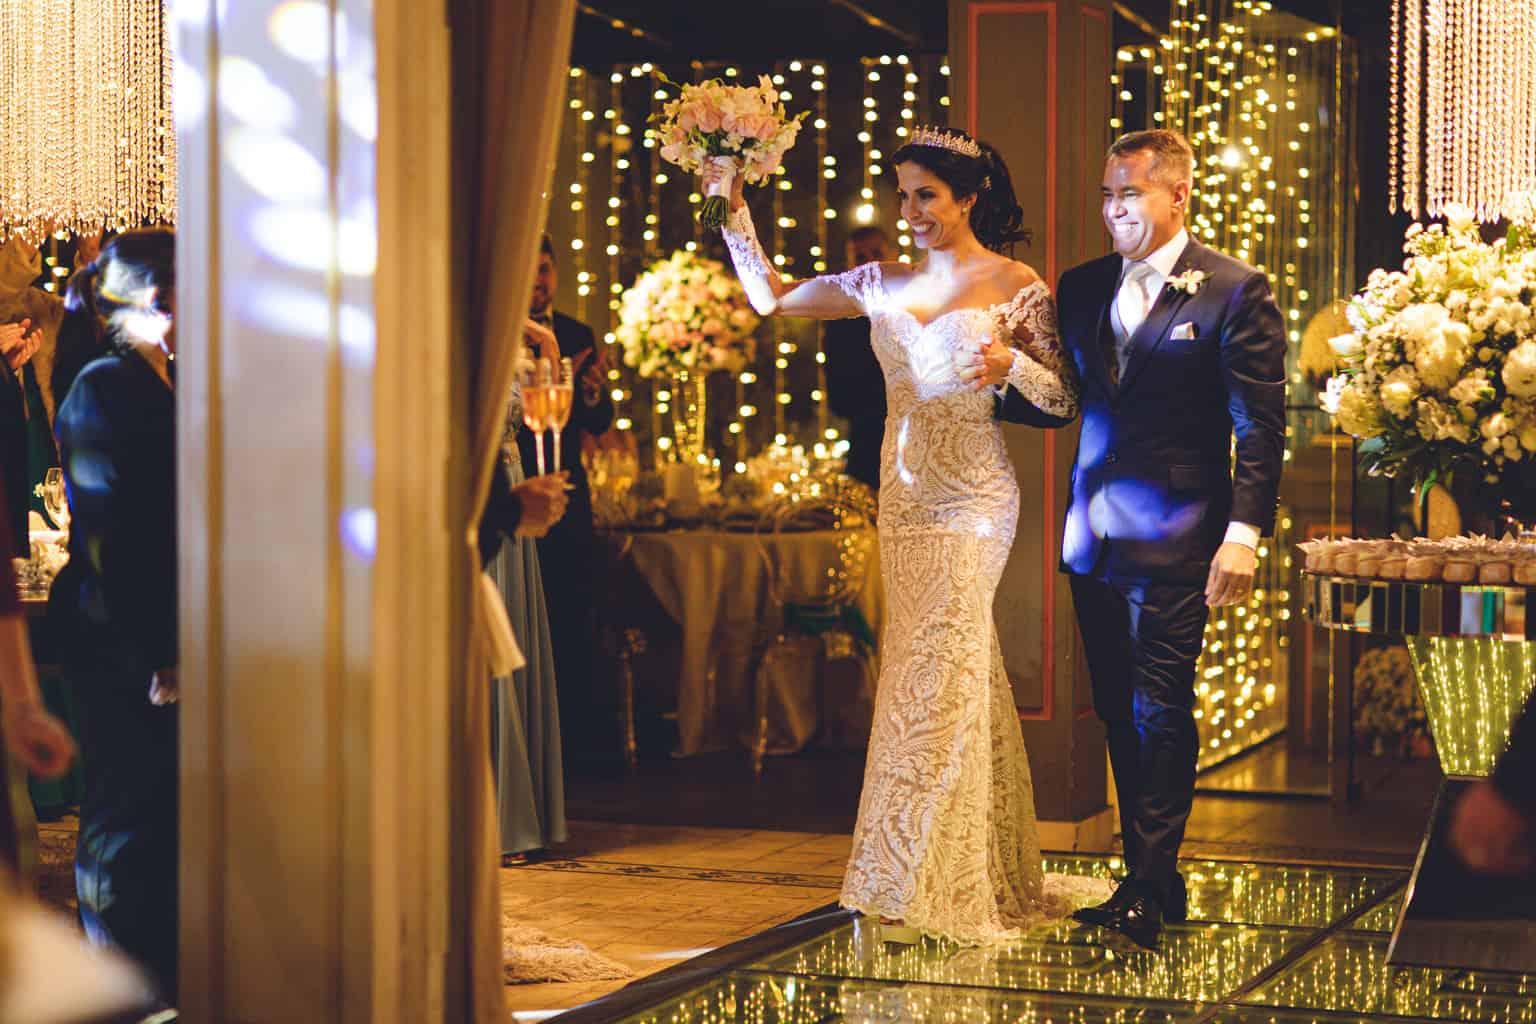 Casamento-de-Bianka-e-Nilo-Fotografia-Marcelo-Schmoeller-SC-Alameda-Casa-Rosa-03082019_bianka-e-nilo_2237